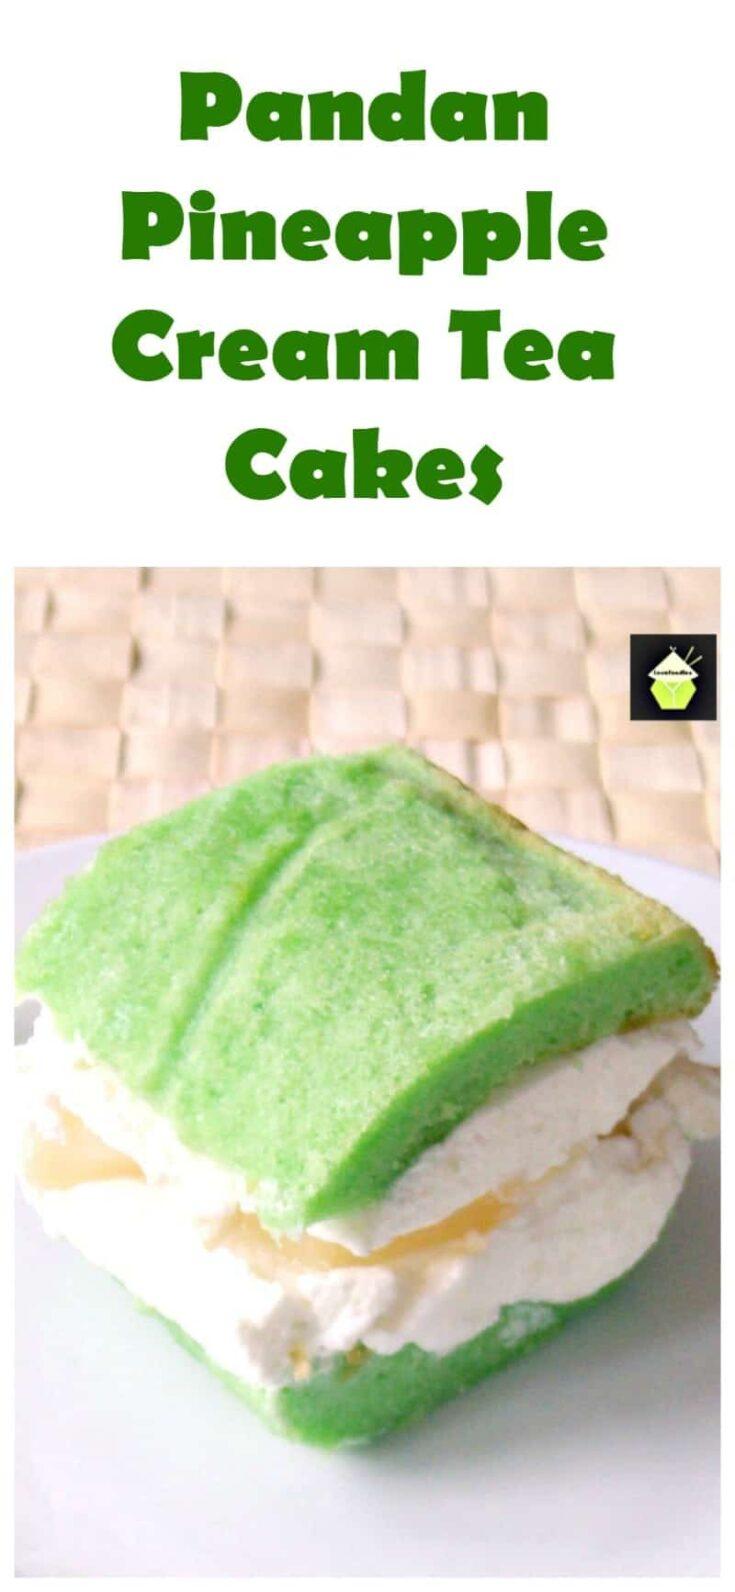 Pandan Pineapple Cream Tea Cakes PTL